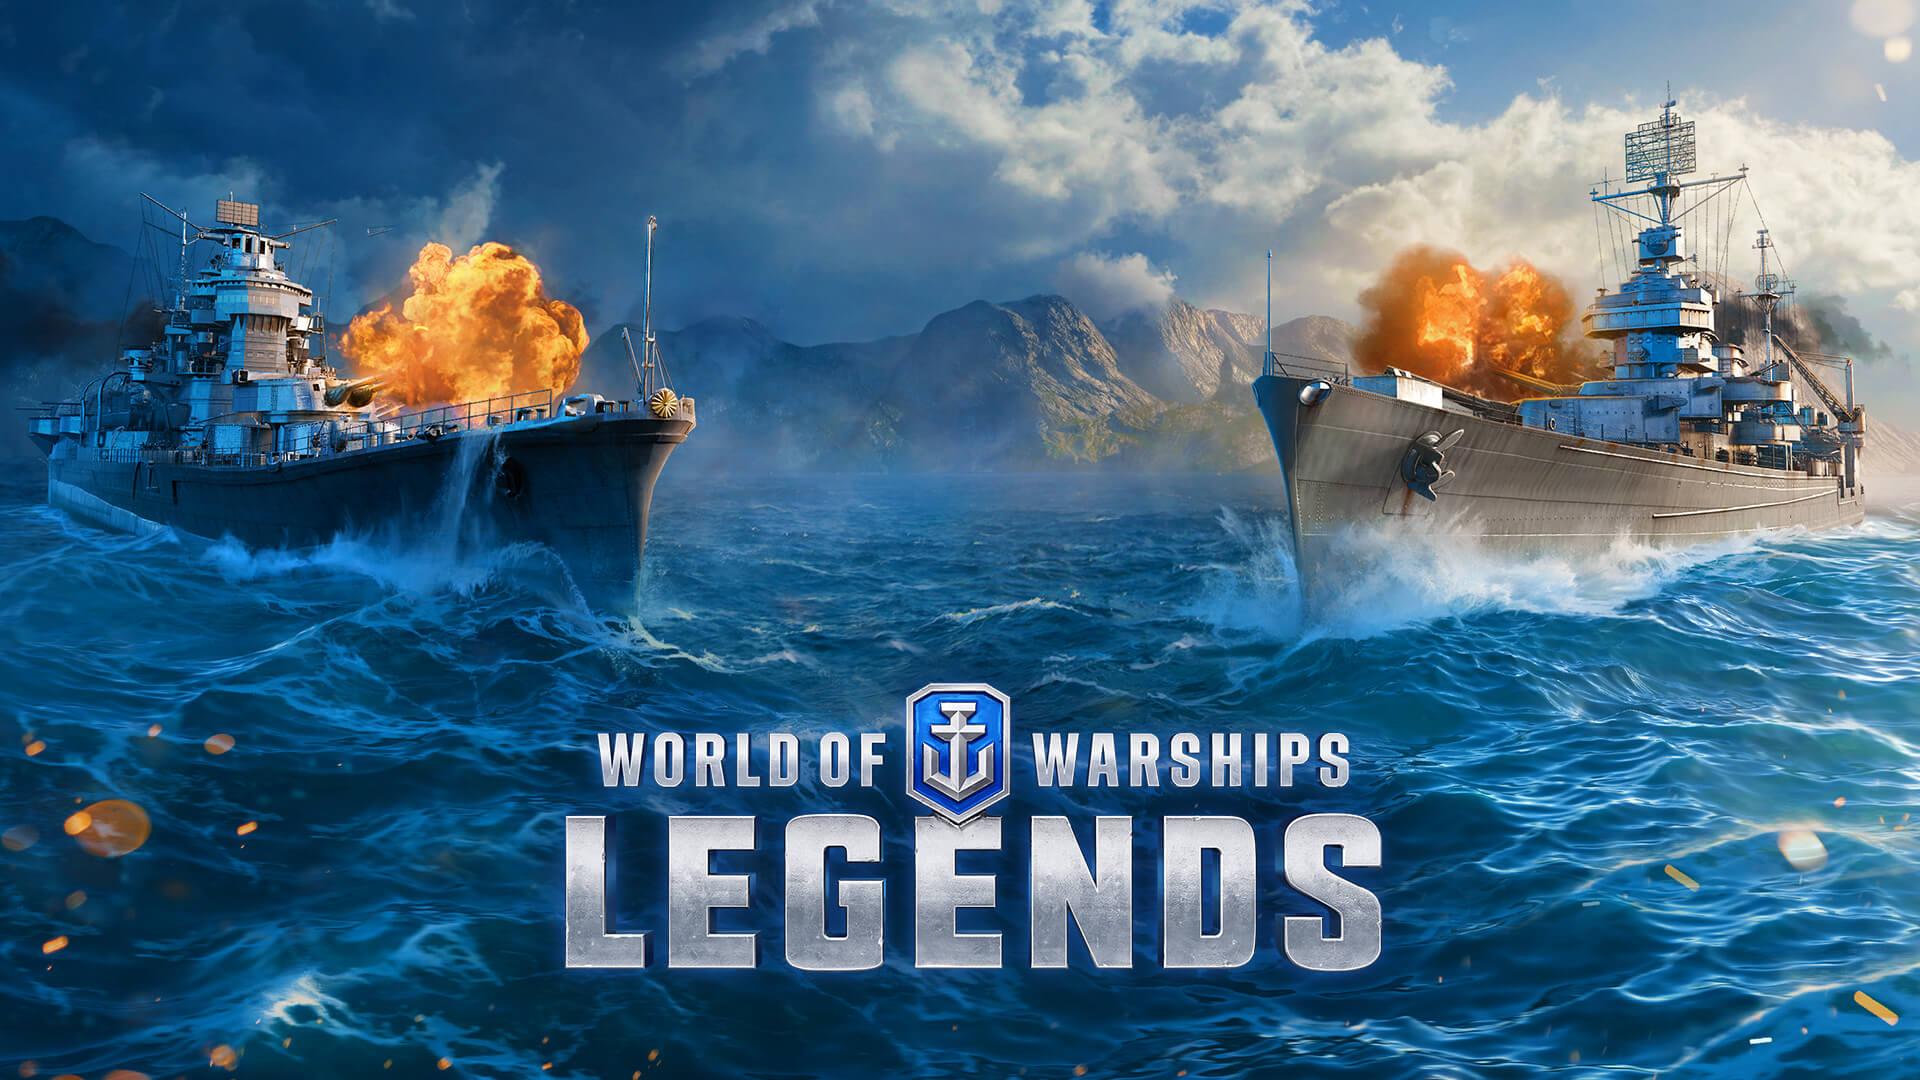 Состоялся релиз World of Warships: Legends